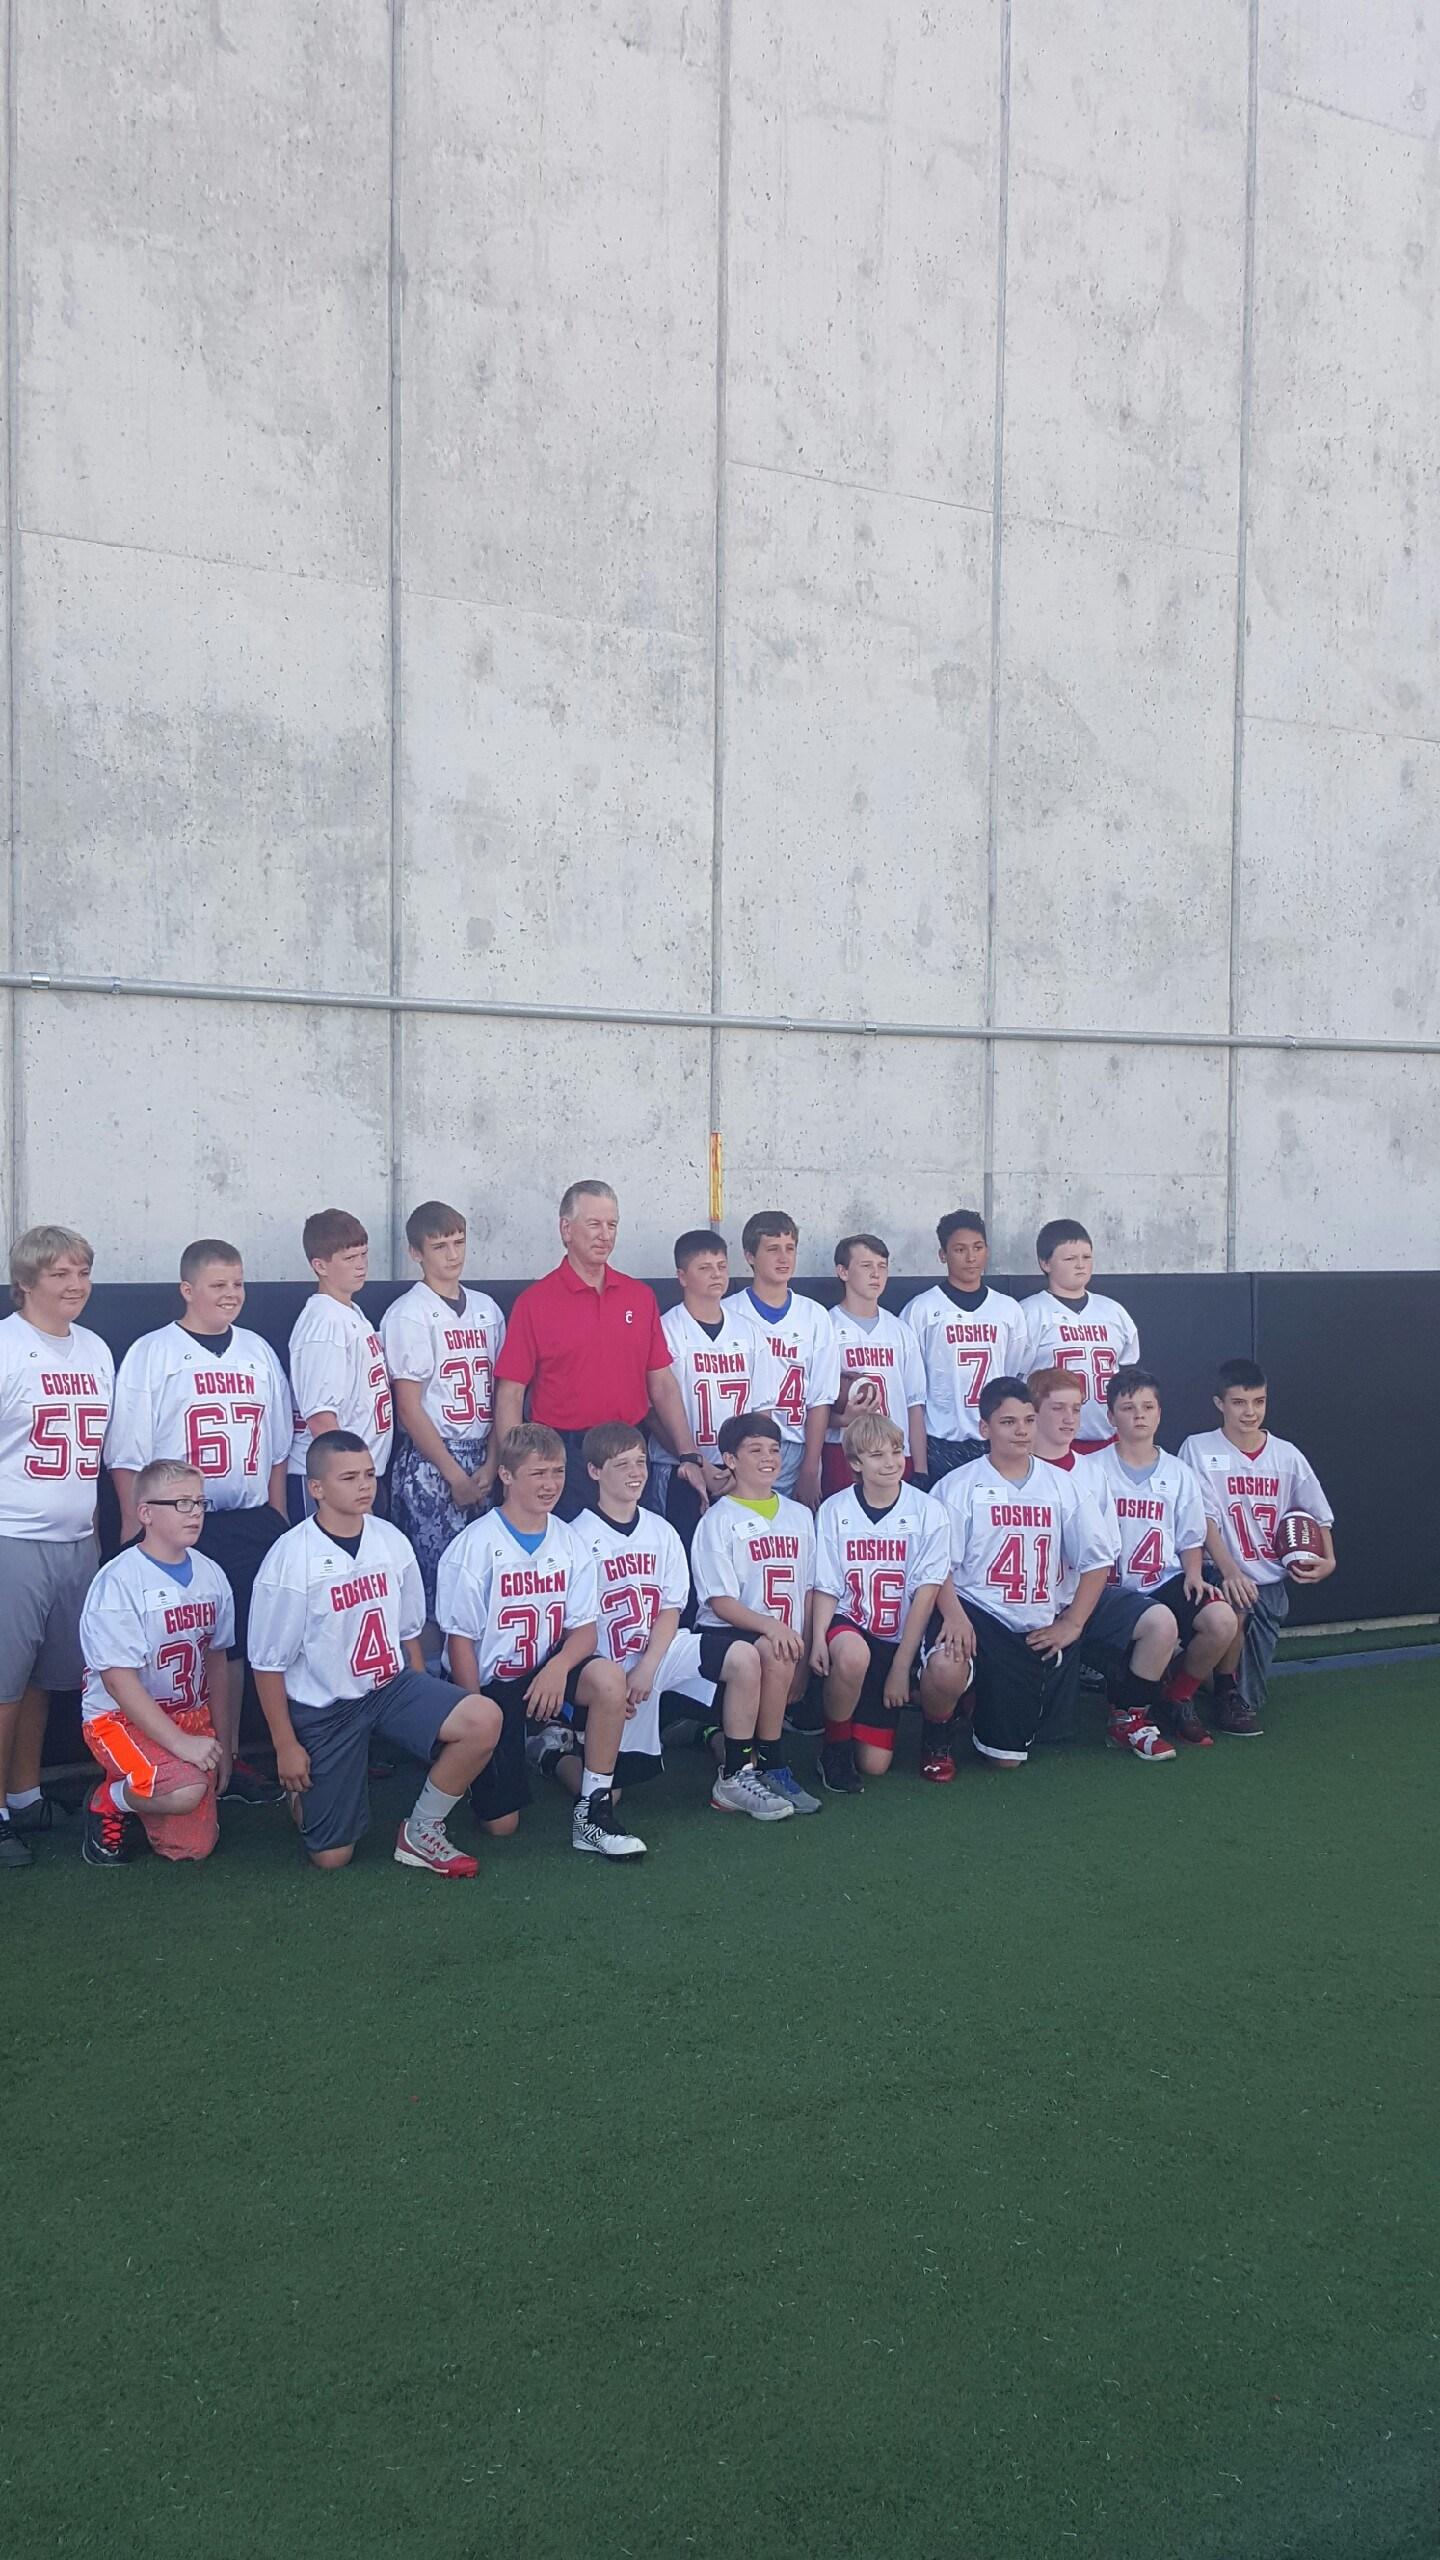 Boys football team at camp